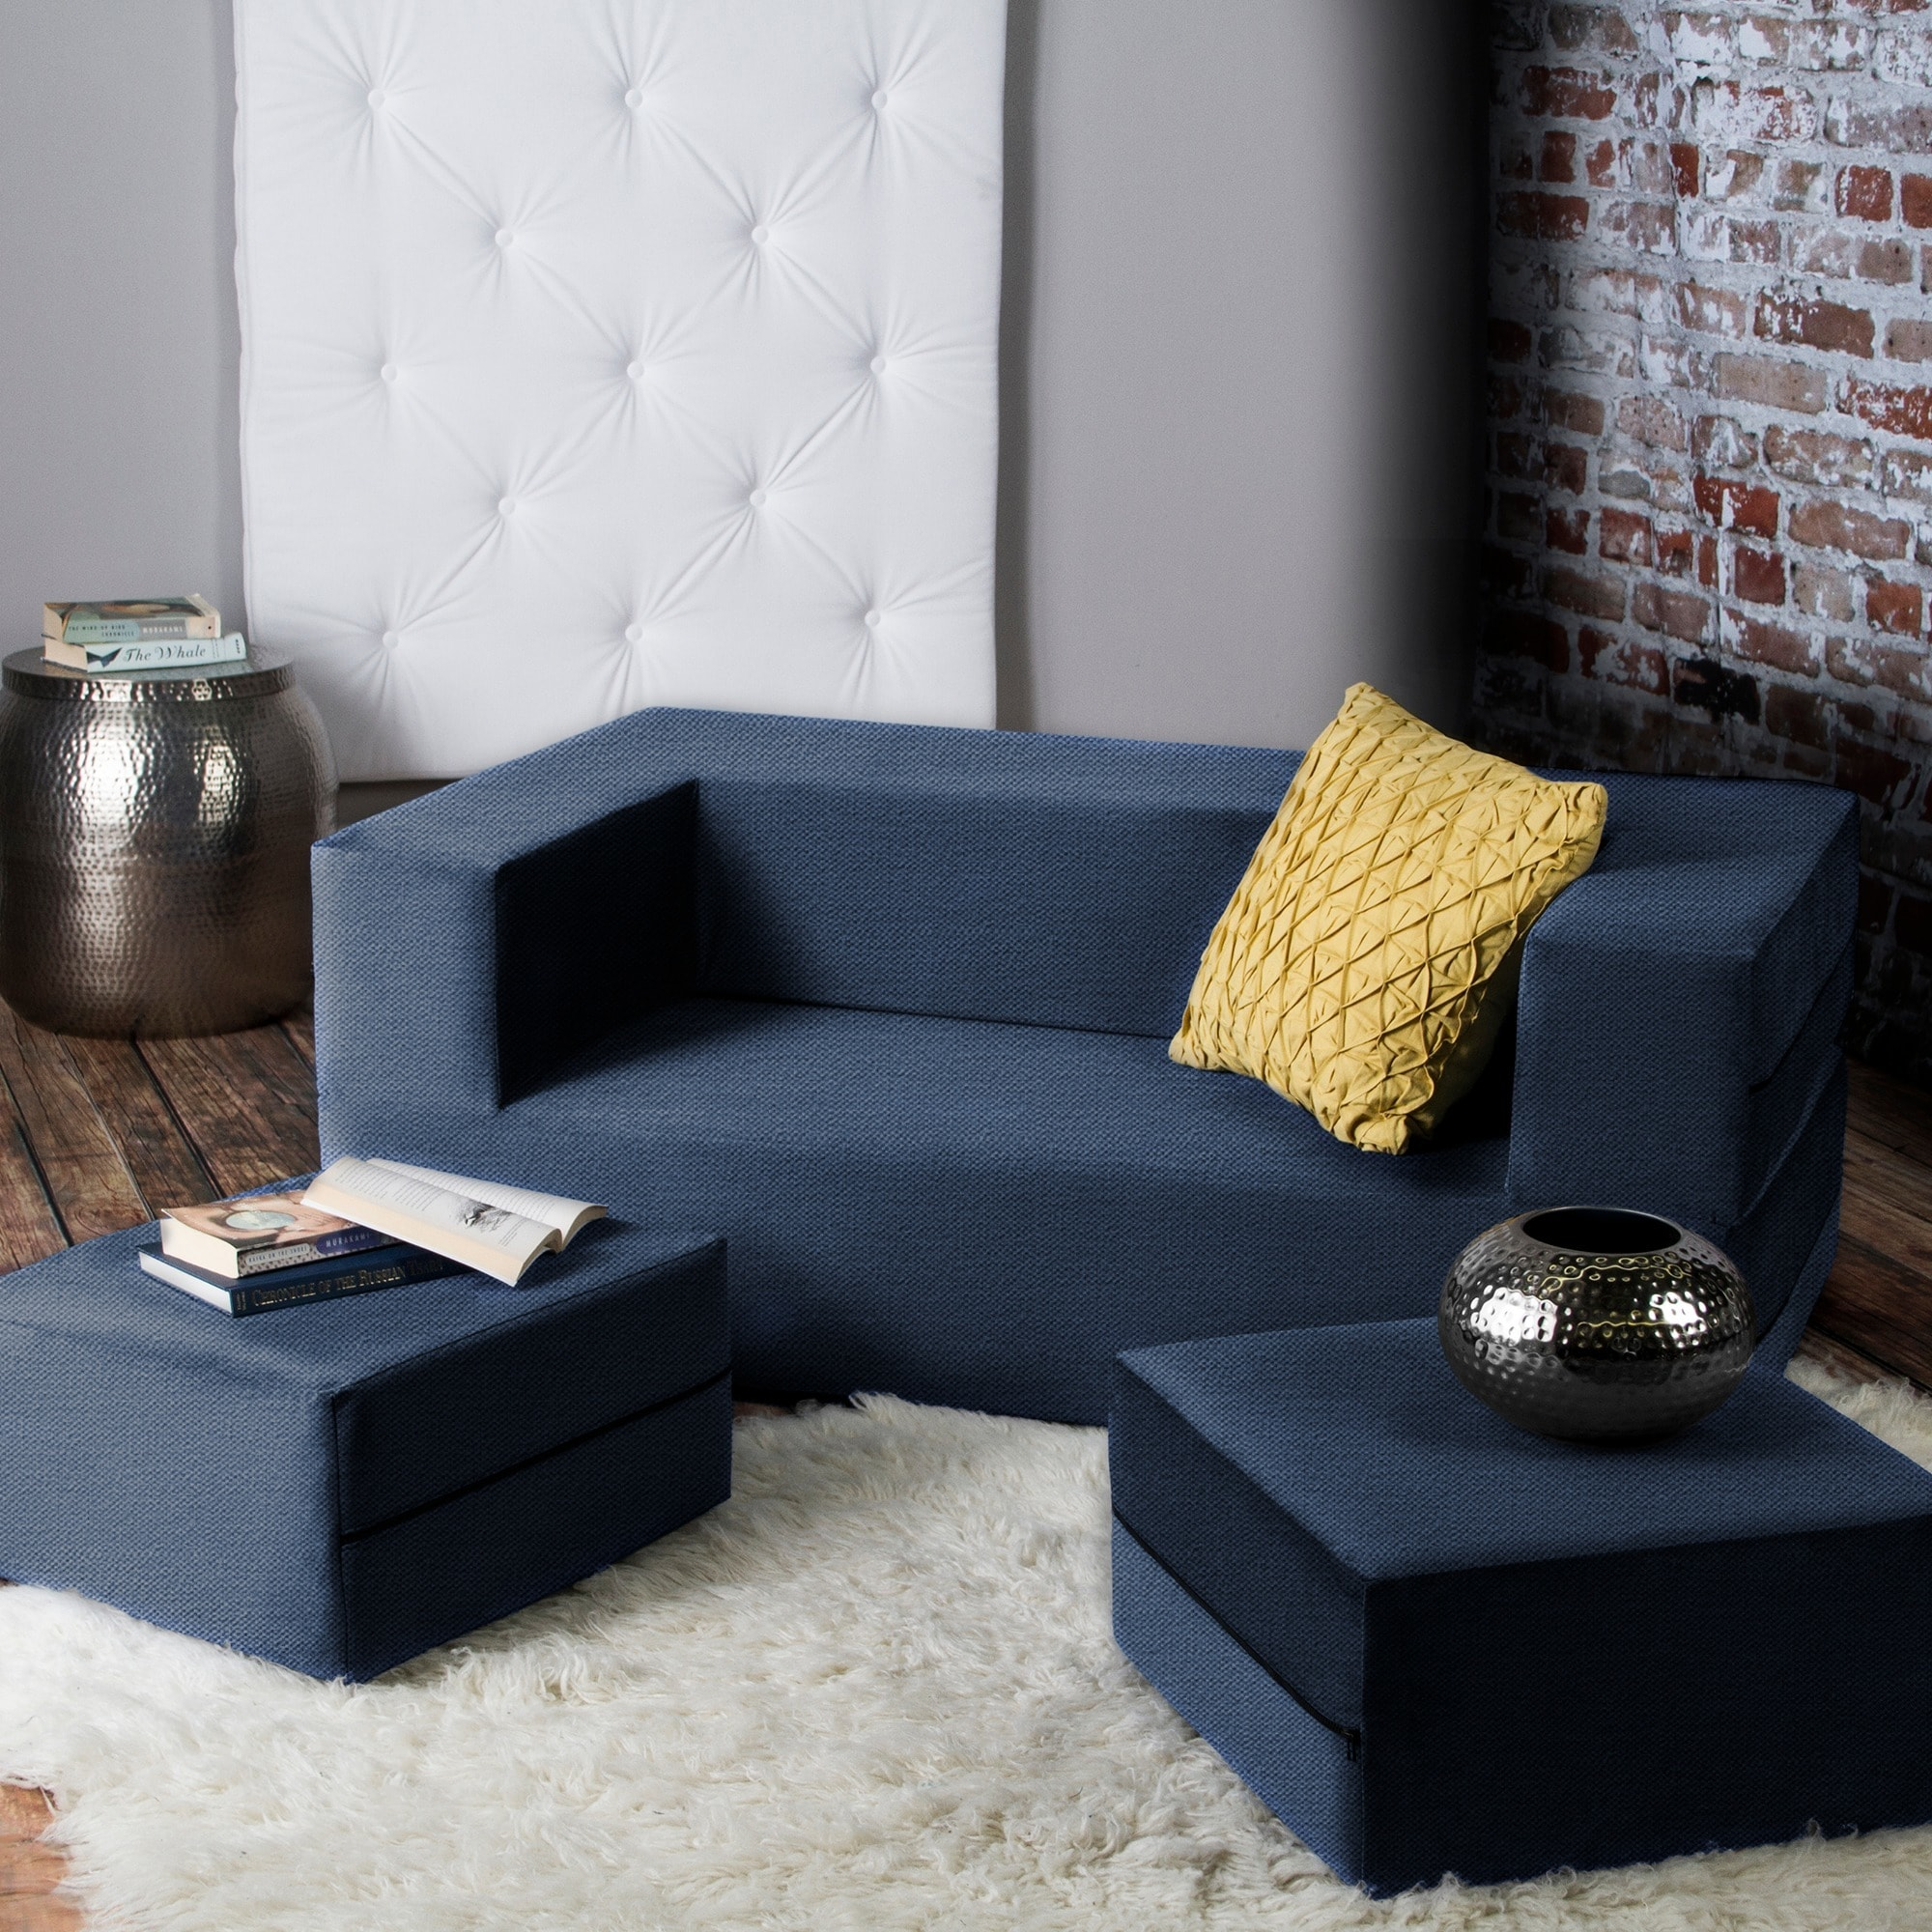 Best Kitchen Gallery: Jaxx Zipline Convertible Queen Size Sleeper Loveseat And Ottoman Set of Loveseat Bed  on rachelxblog.com